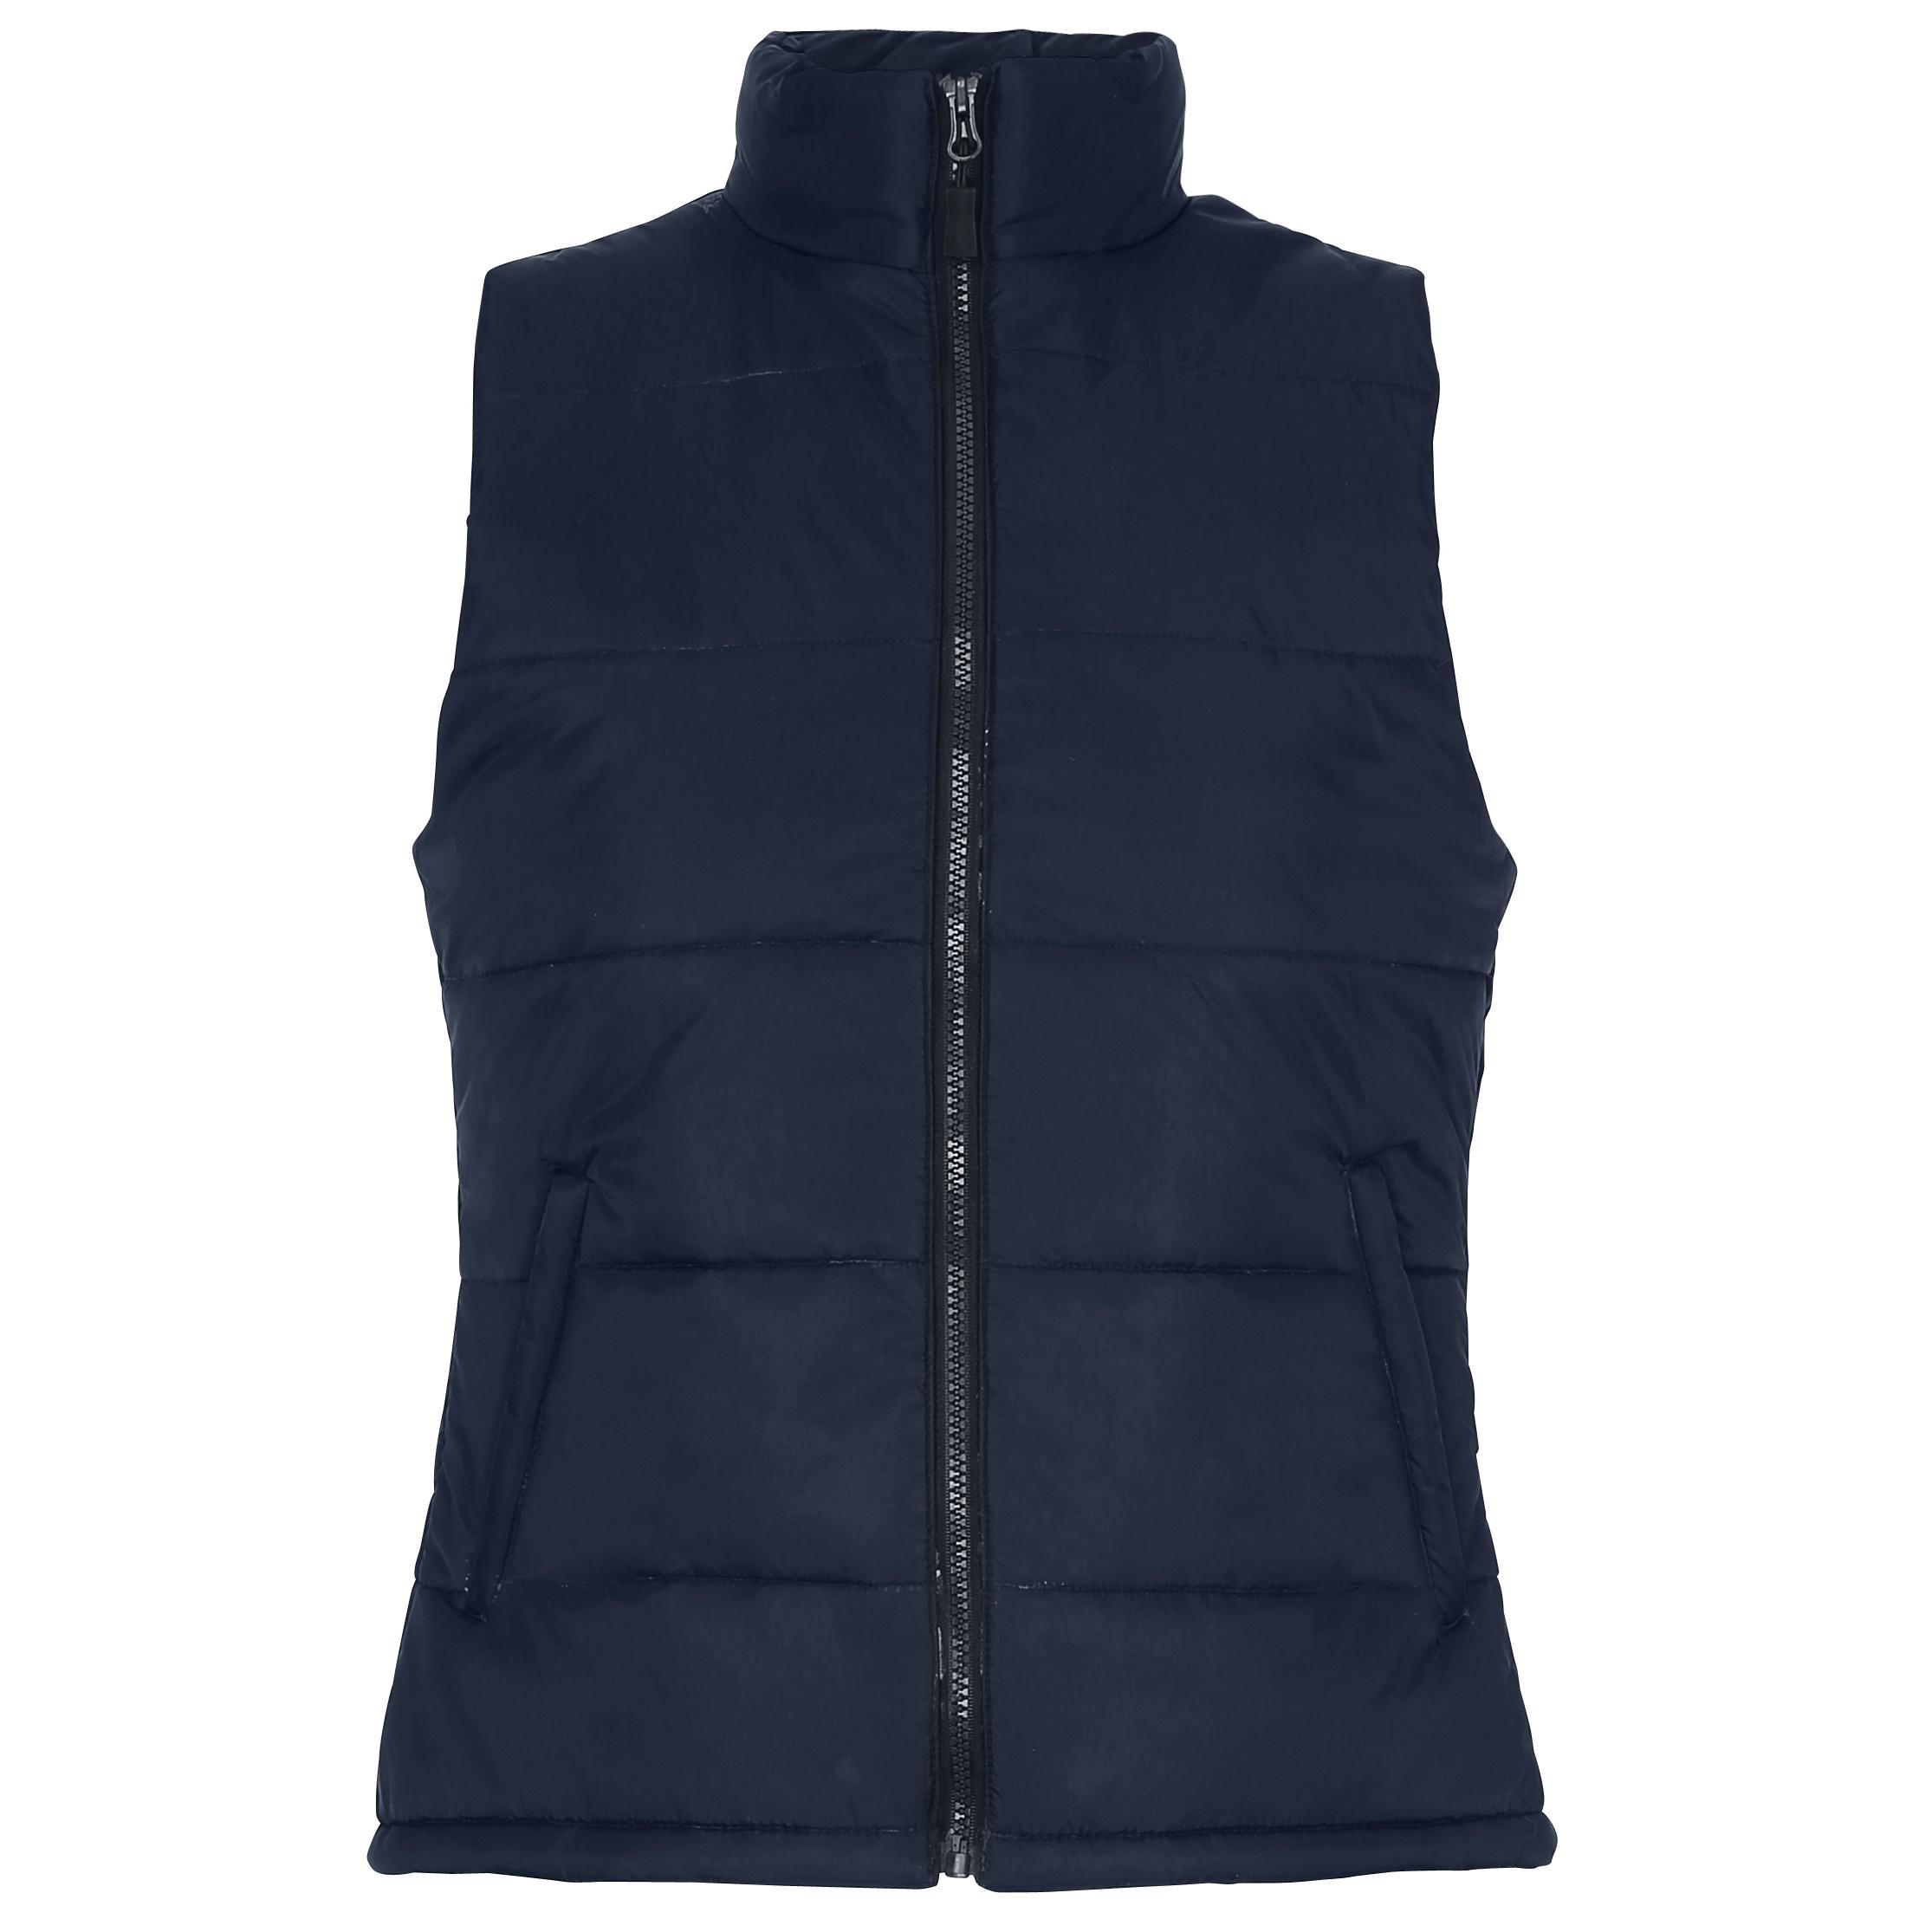 2786 Womens/Ladies Padded Bodywarmer/Gilet Jacket (XS) (Navy)